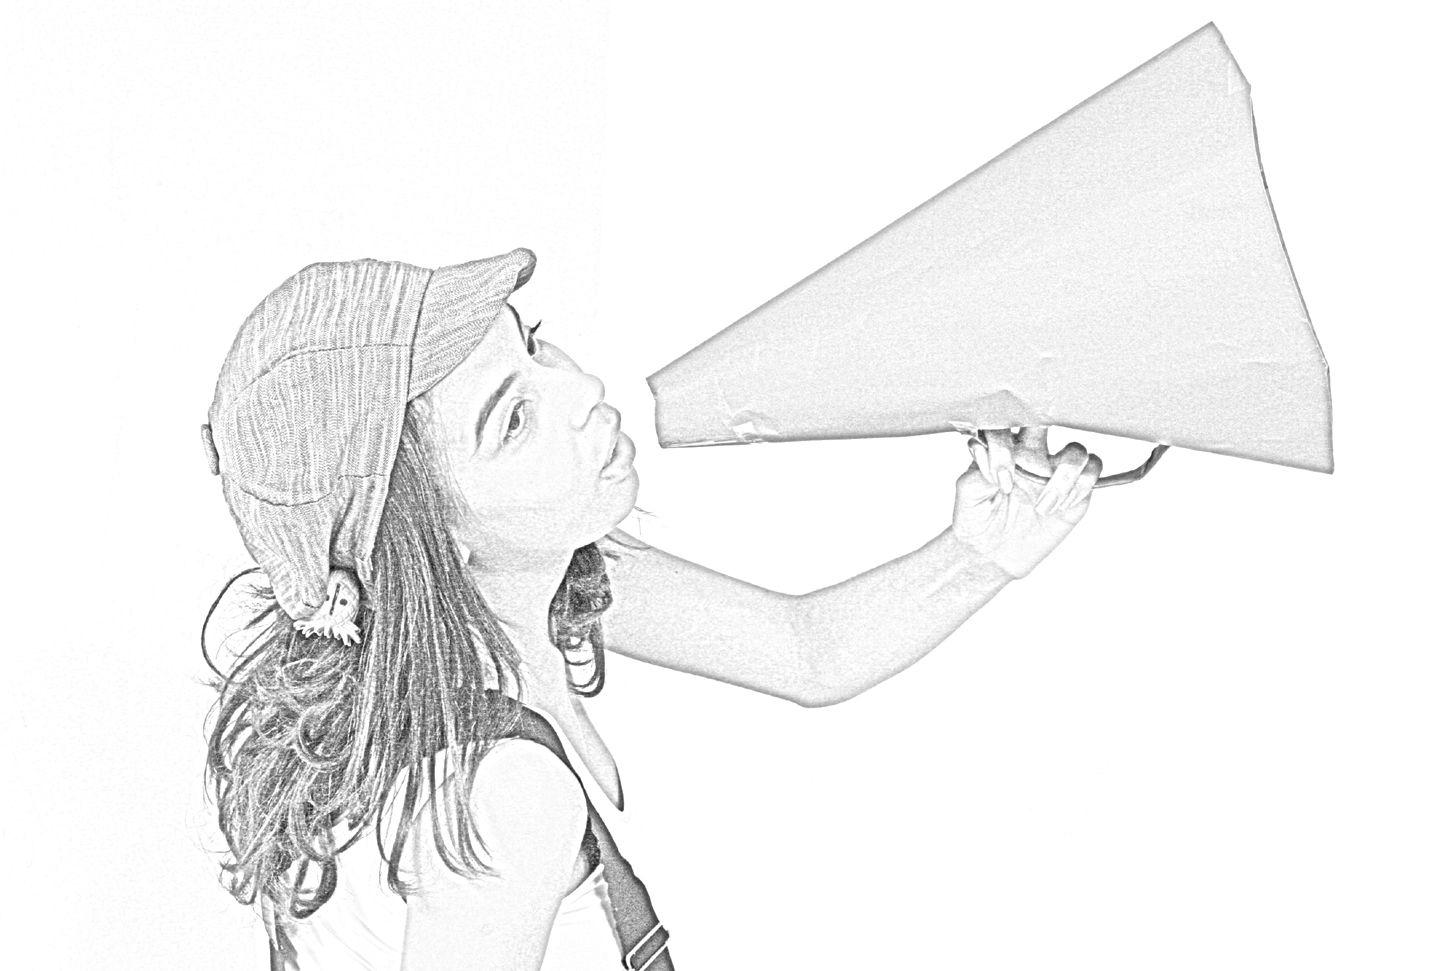 Digital Art Special Illustration by Carlos Campos / A Diretora #25